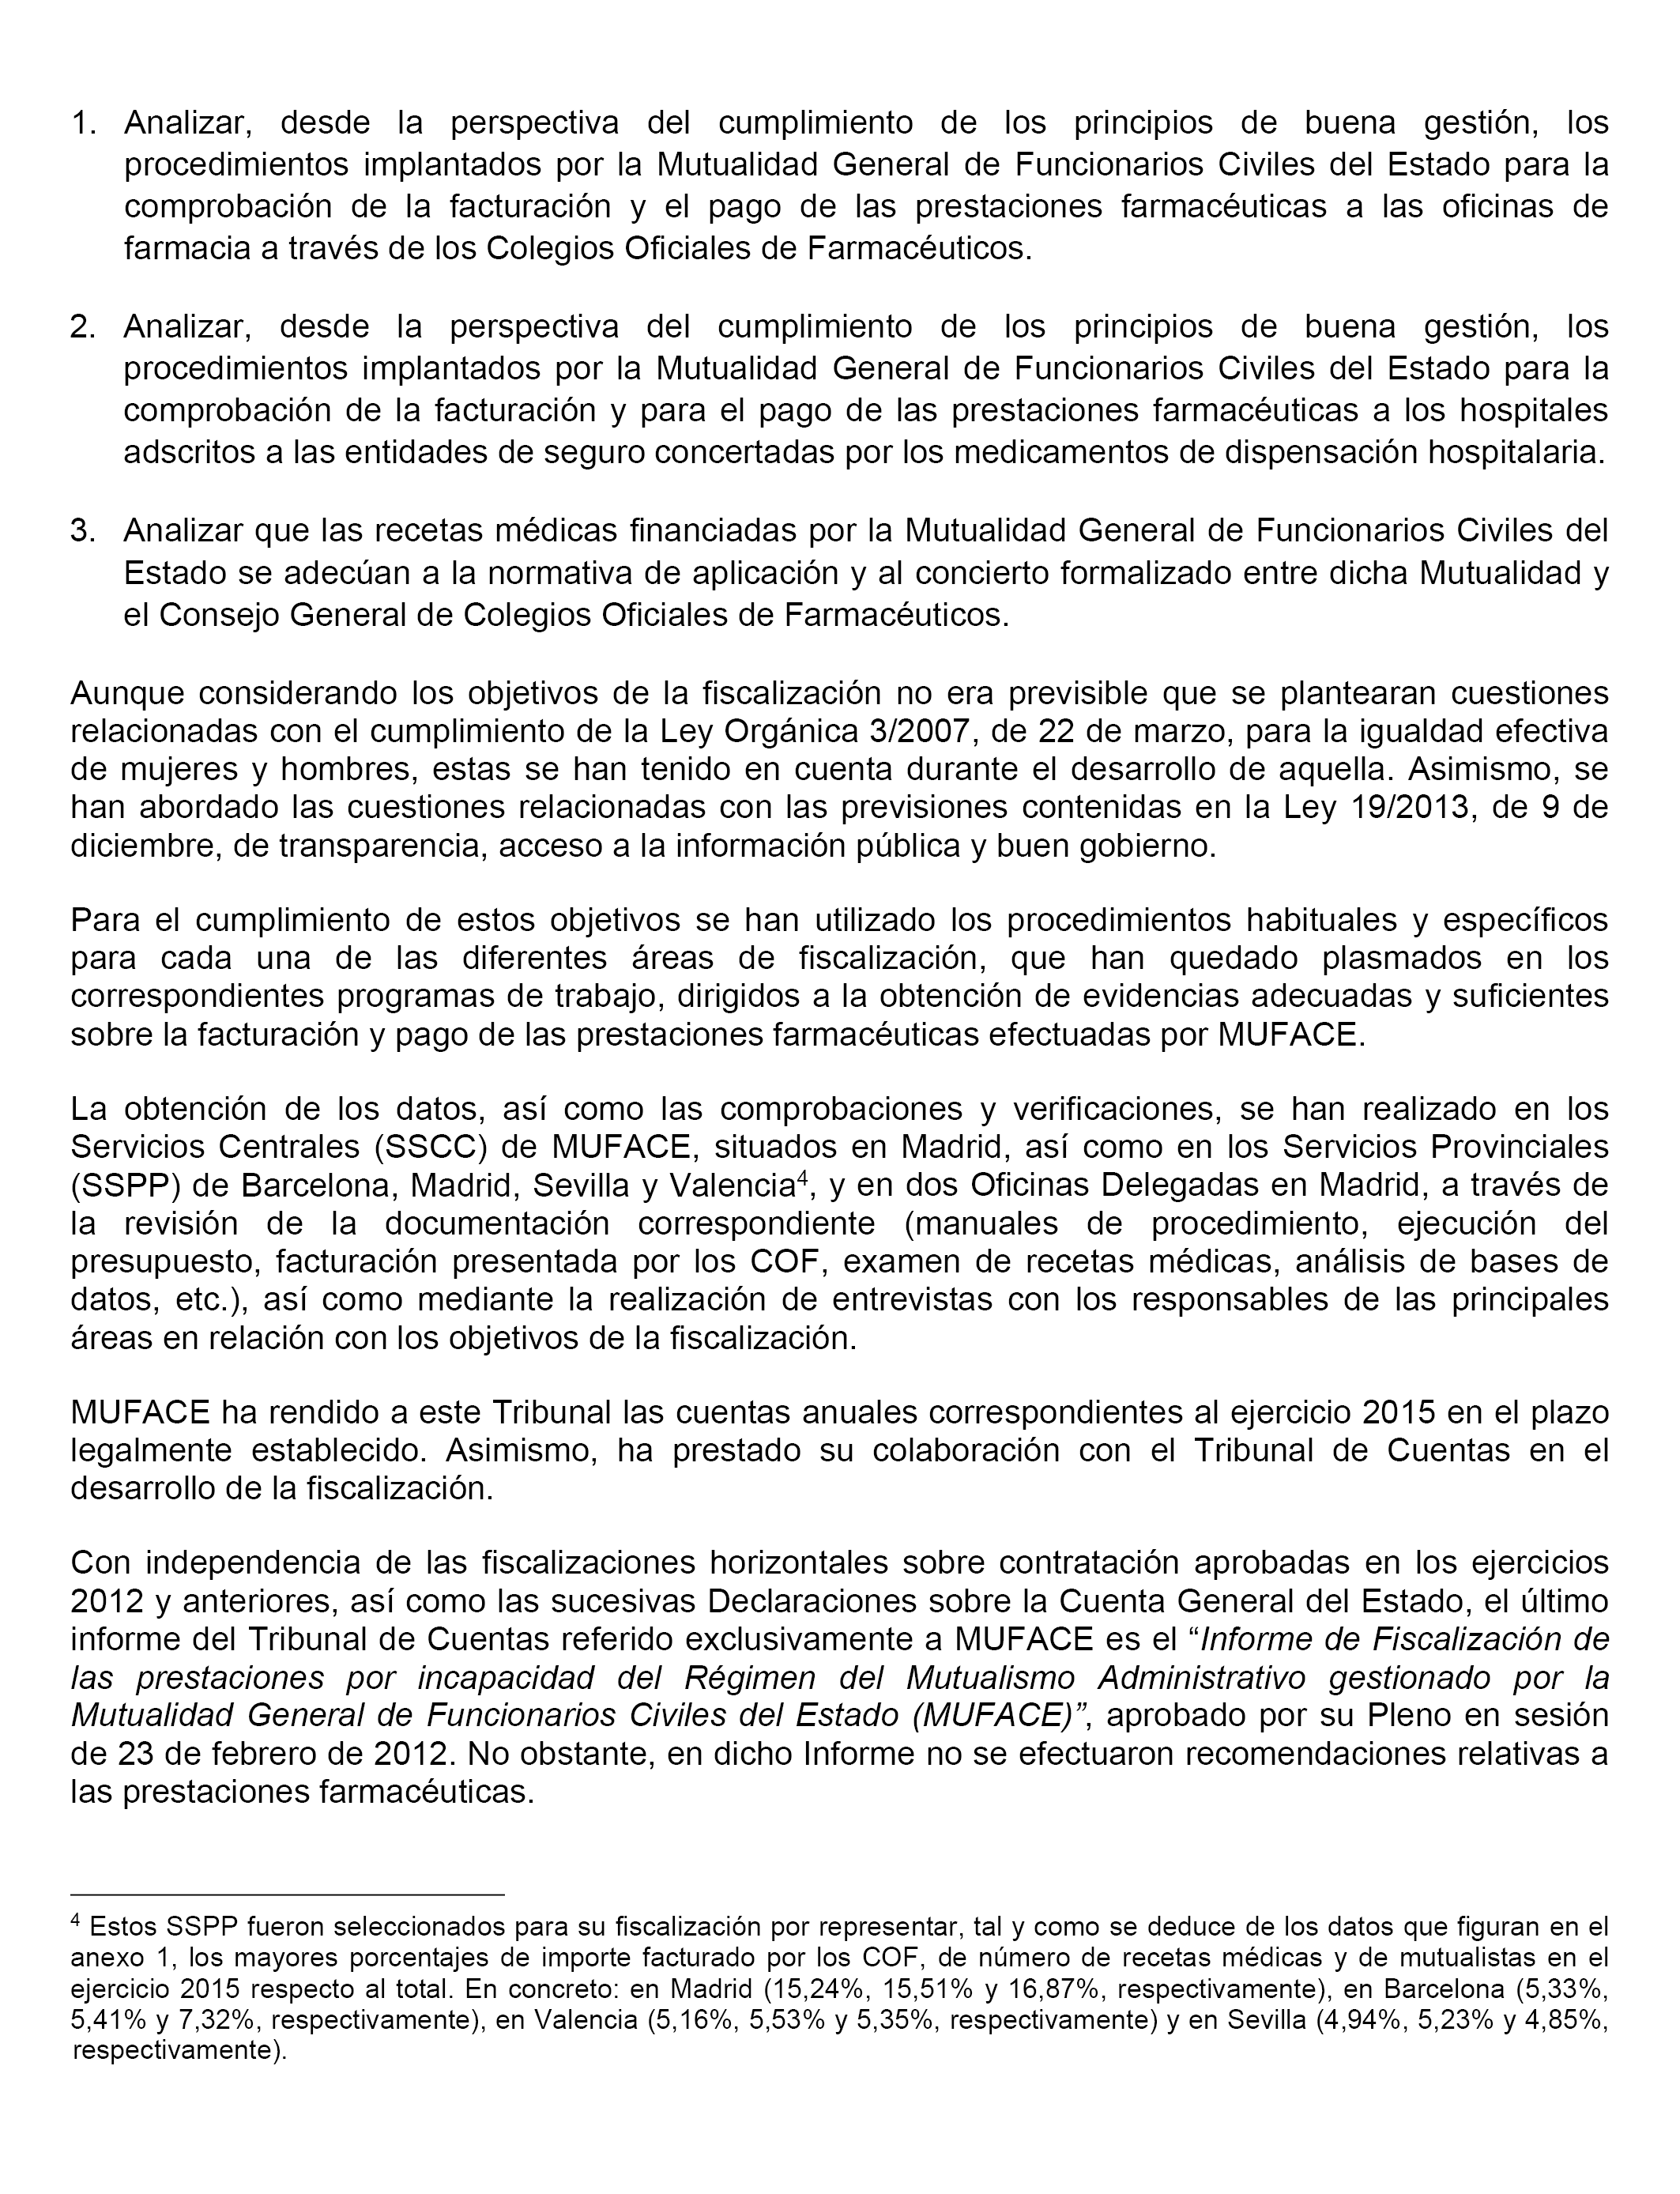 BOE.es - Documento BOE-A-2018-2665